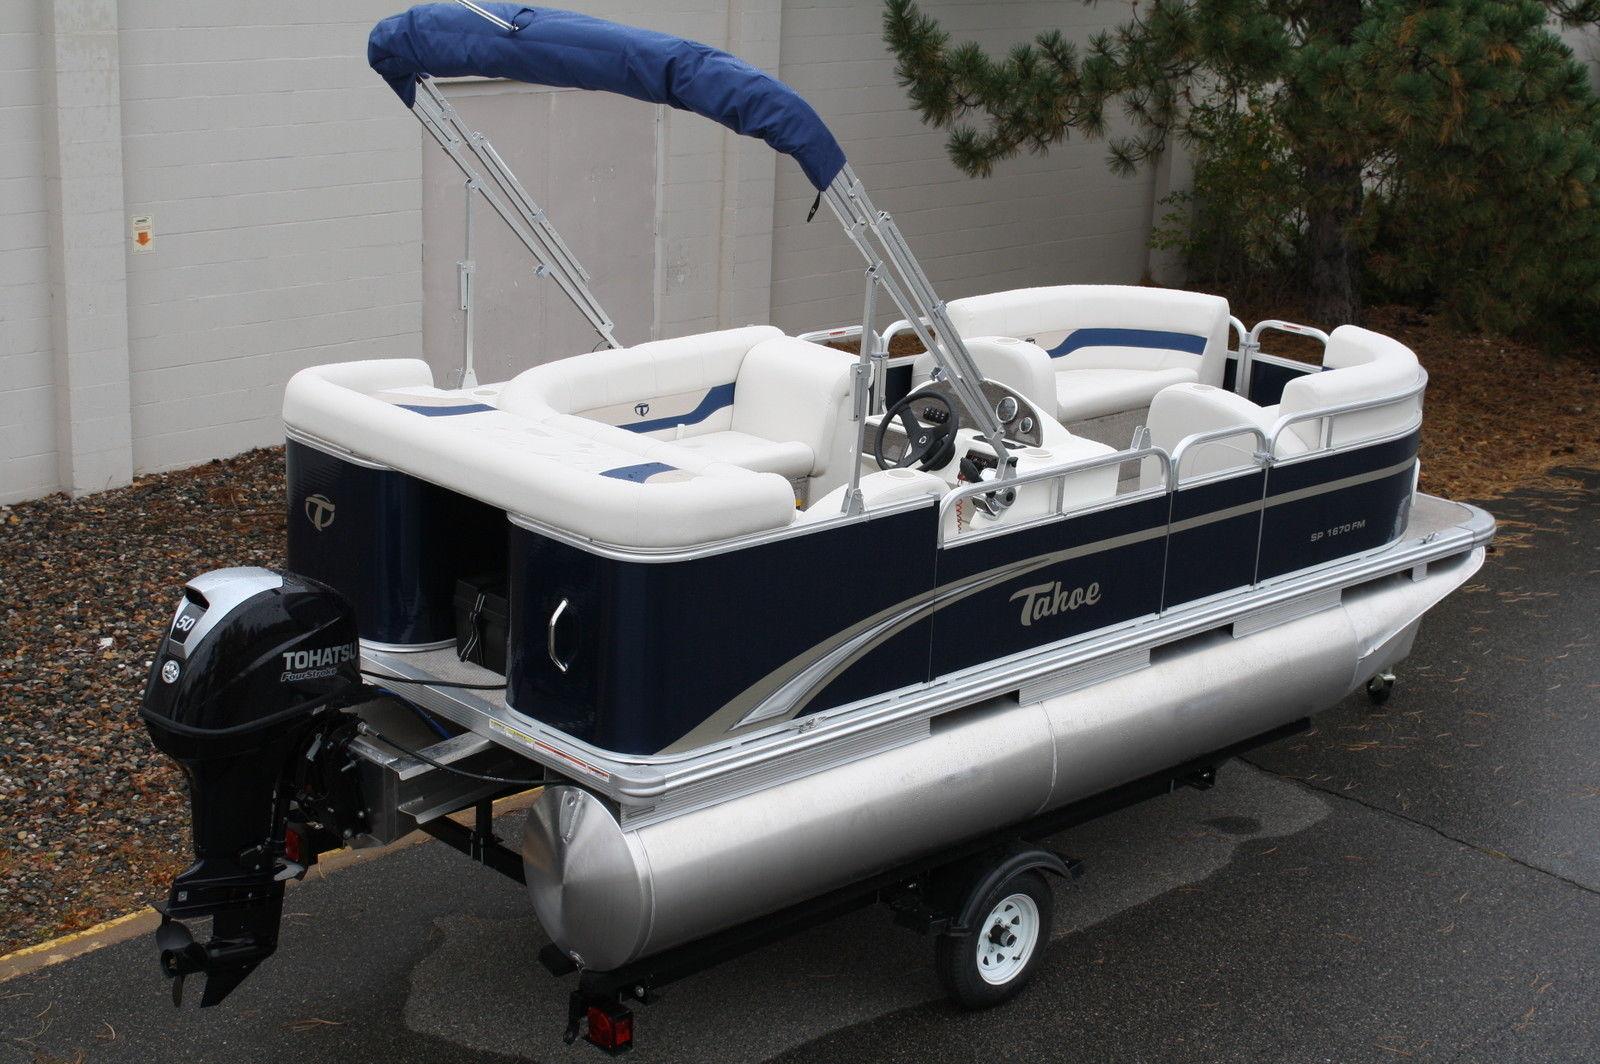 2014 Grand Island 16 Ft Pontoon Boat For Sale